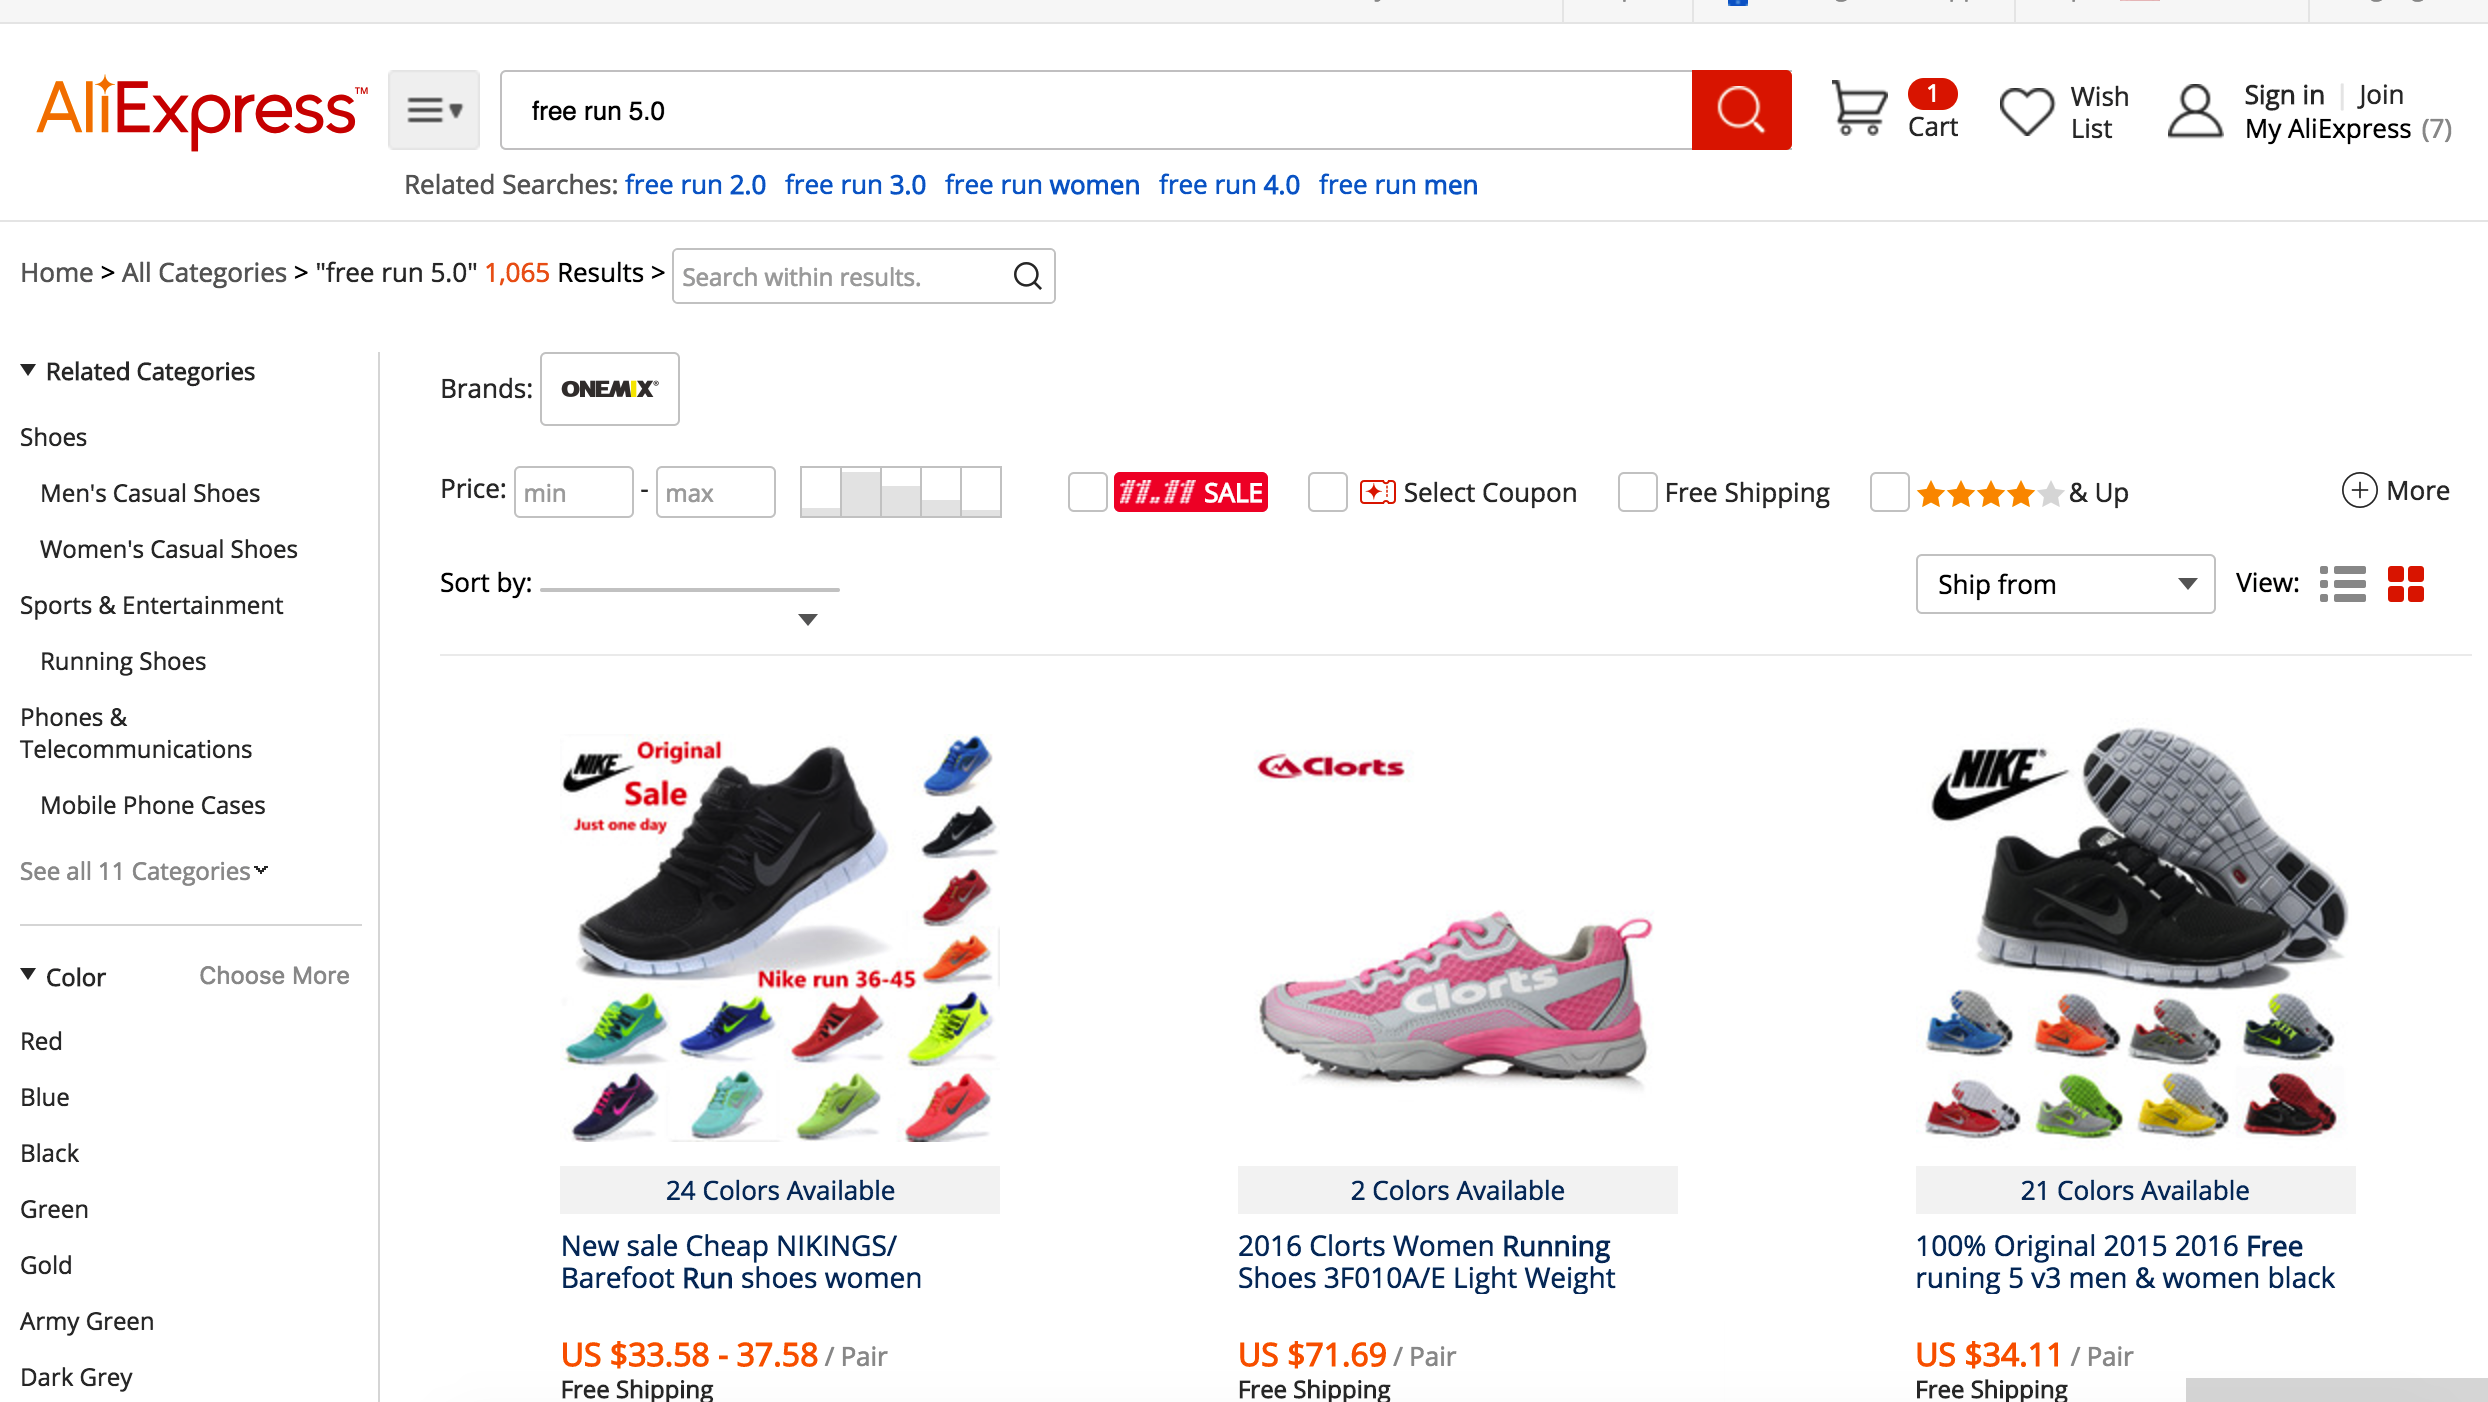 fa63b545be2e 6 Secret Hacks - Brand Search on AliExpress